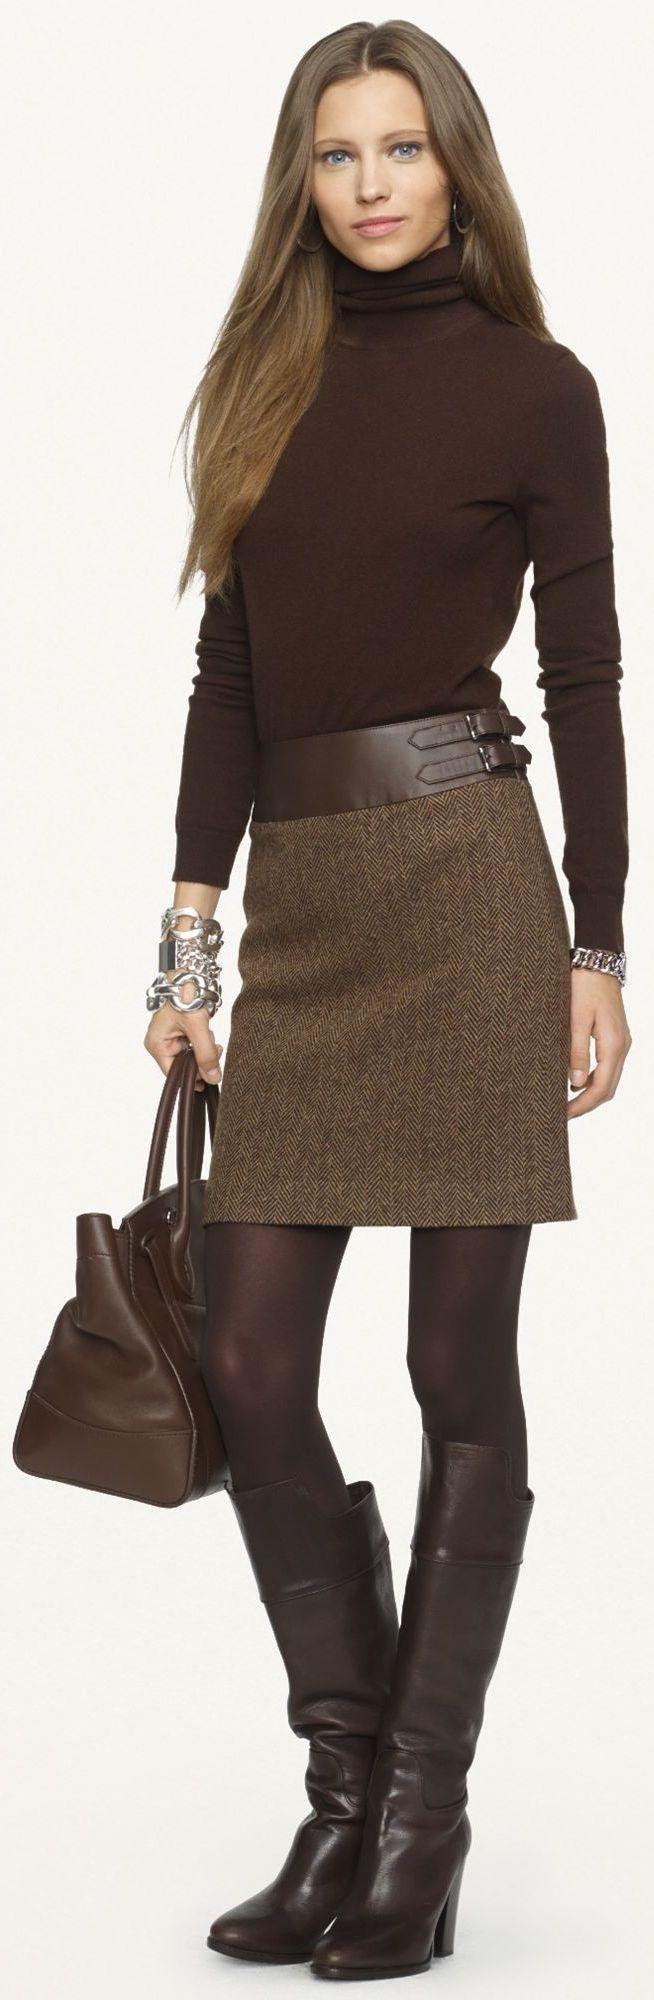 Ralph Lauren Black Label - Leather-Trimmed Kieron Skirt